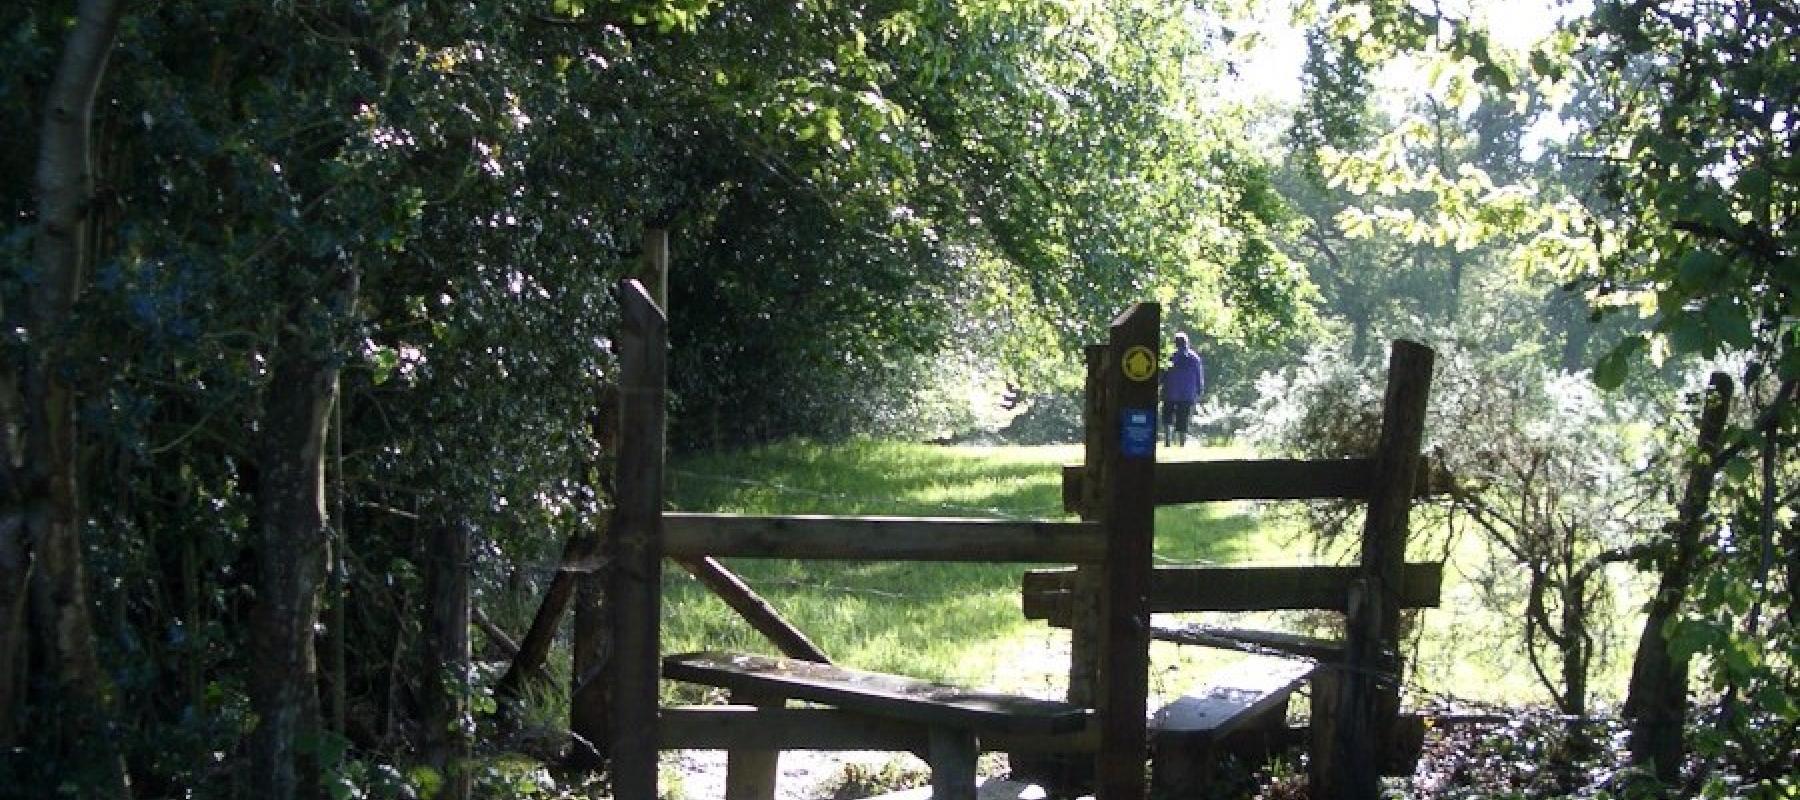 Countryside walks near Uckfield